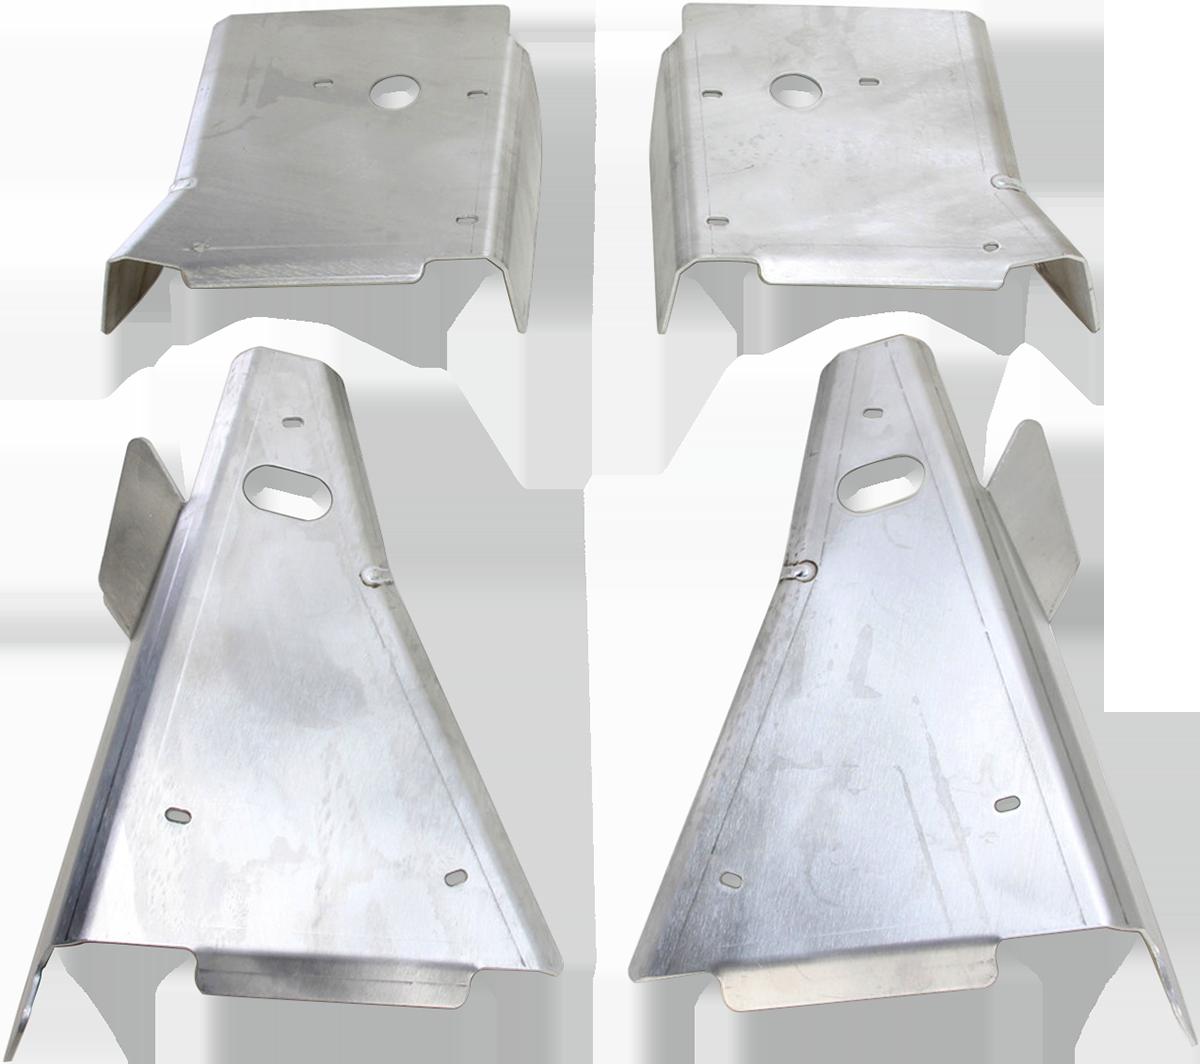 Moose Racing UTV Aluminum Front A-Arm Guard Kit for 15-19 Polaris RZR General